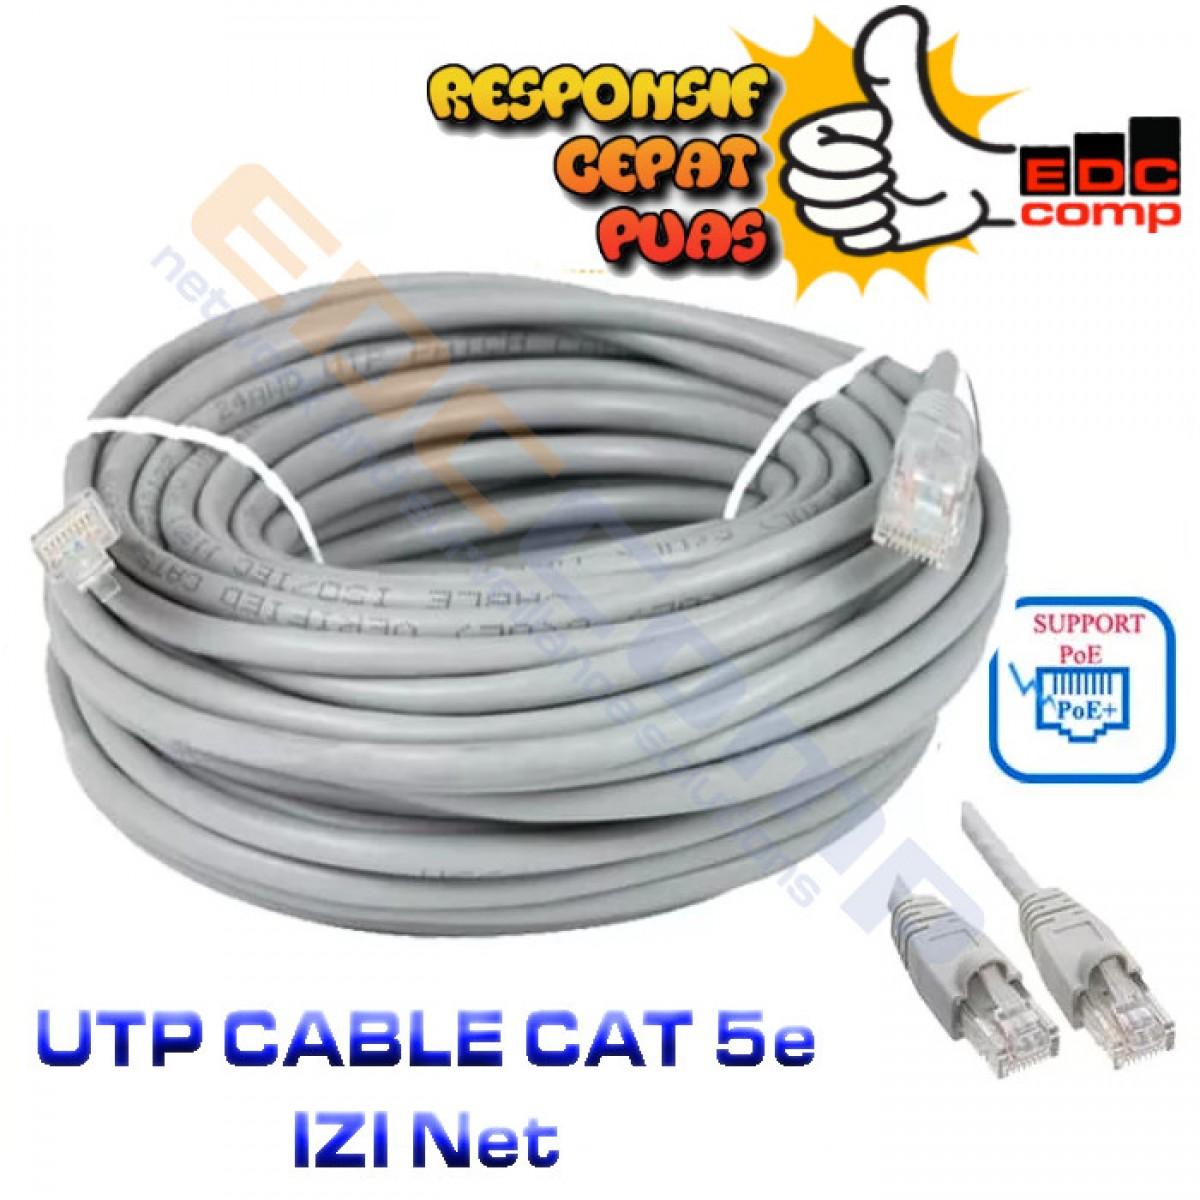 UTP Cable IZINET Cat5E 35 Meter - EdcComp